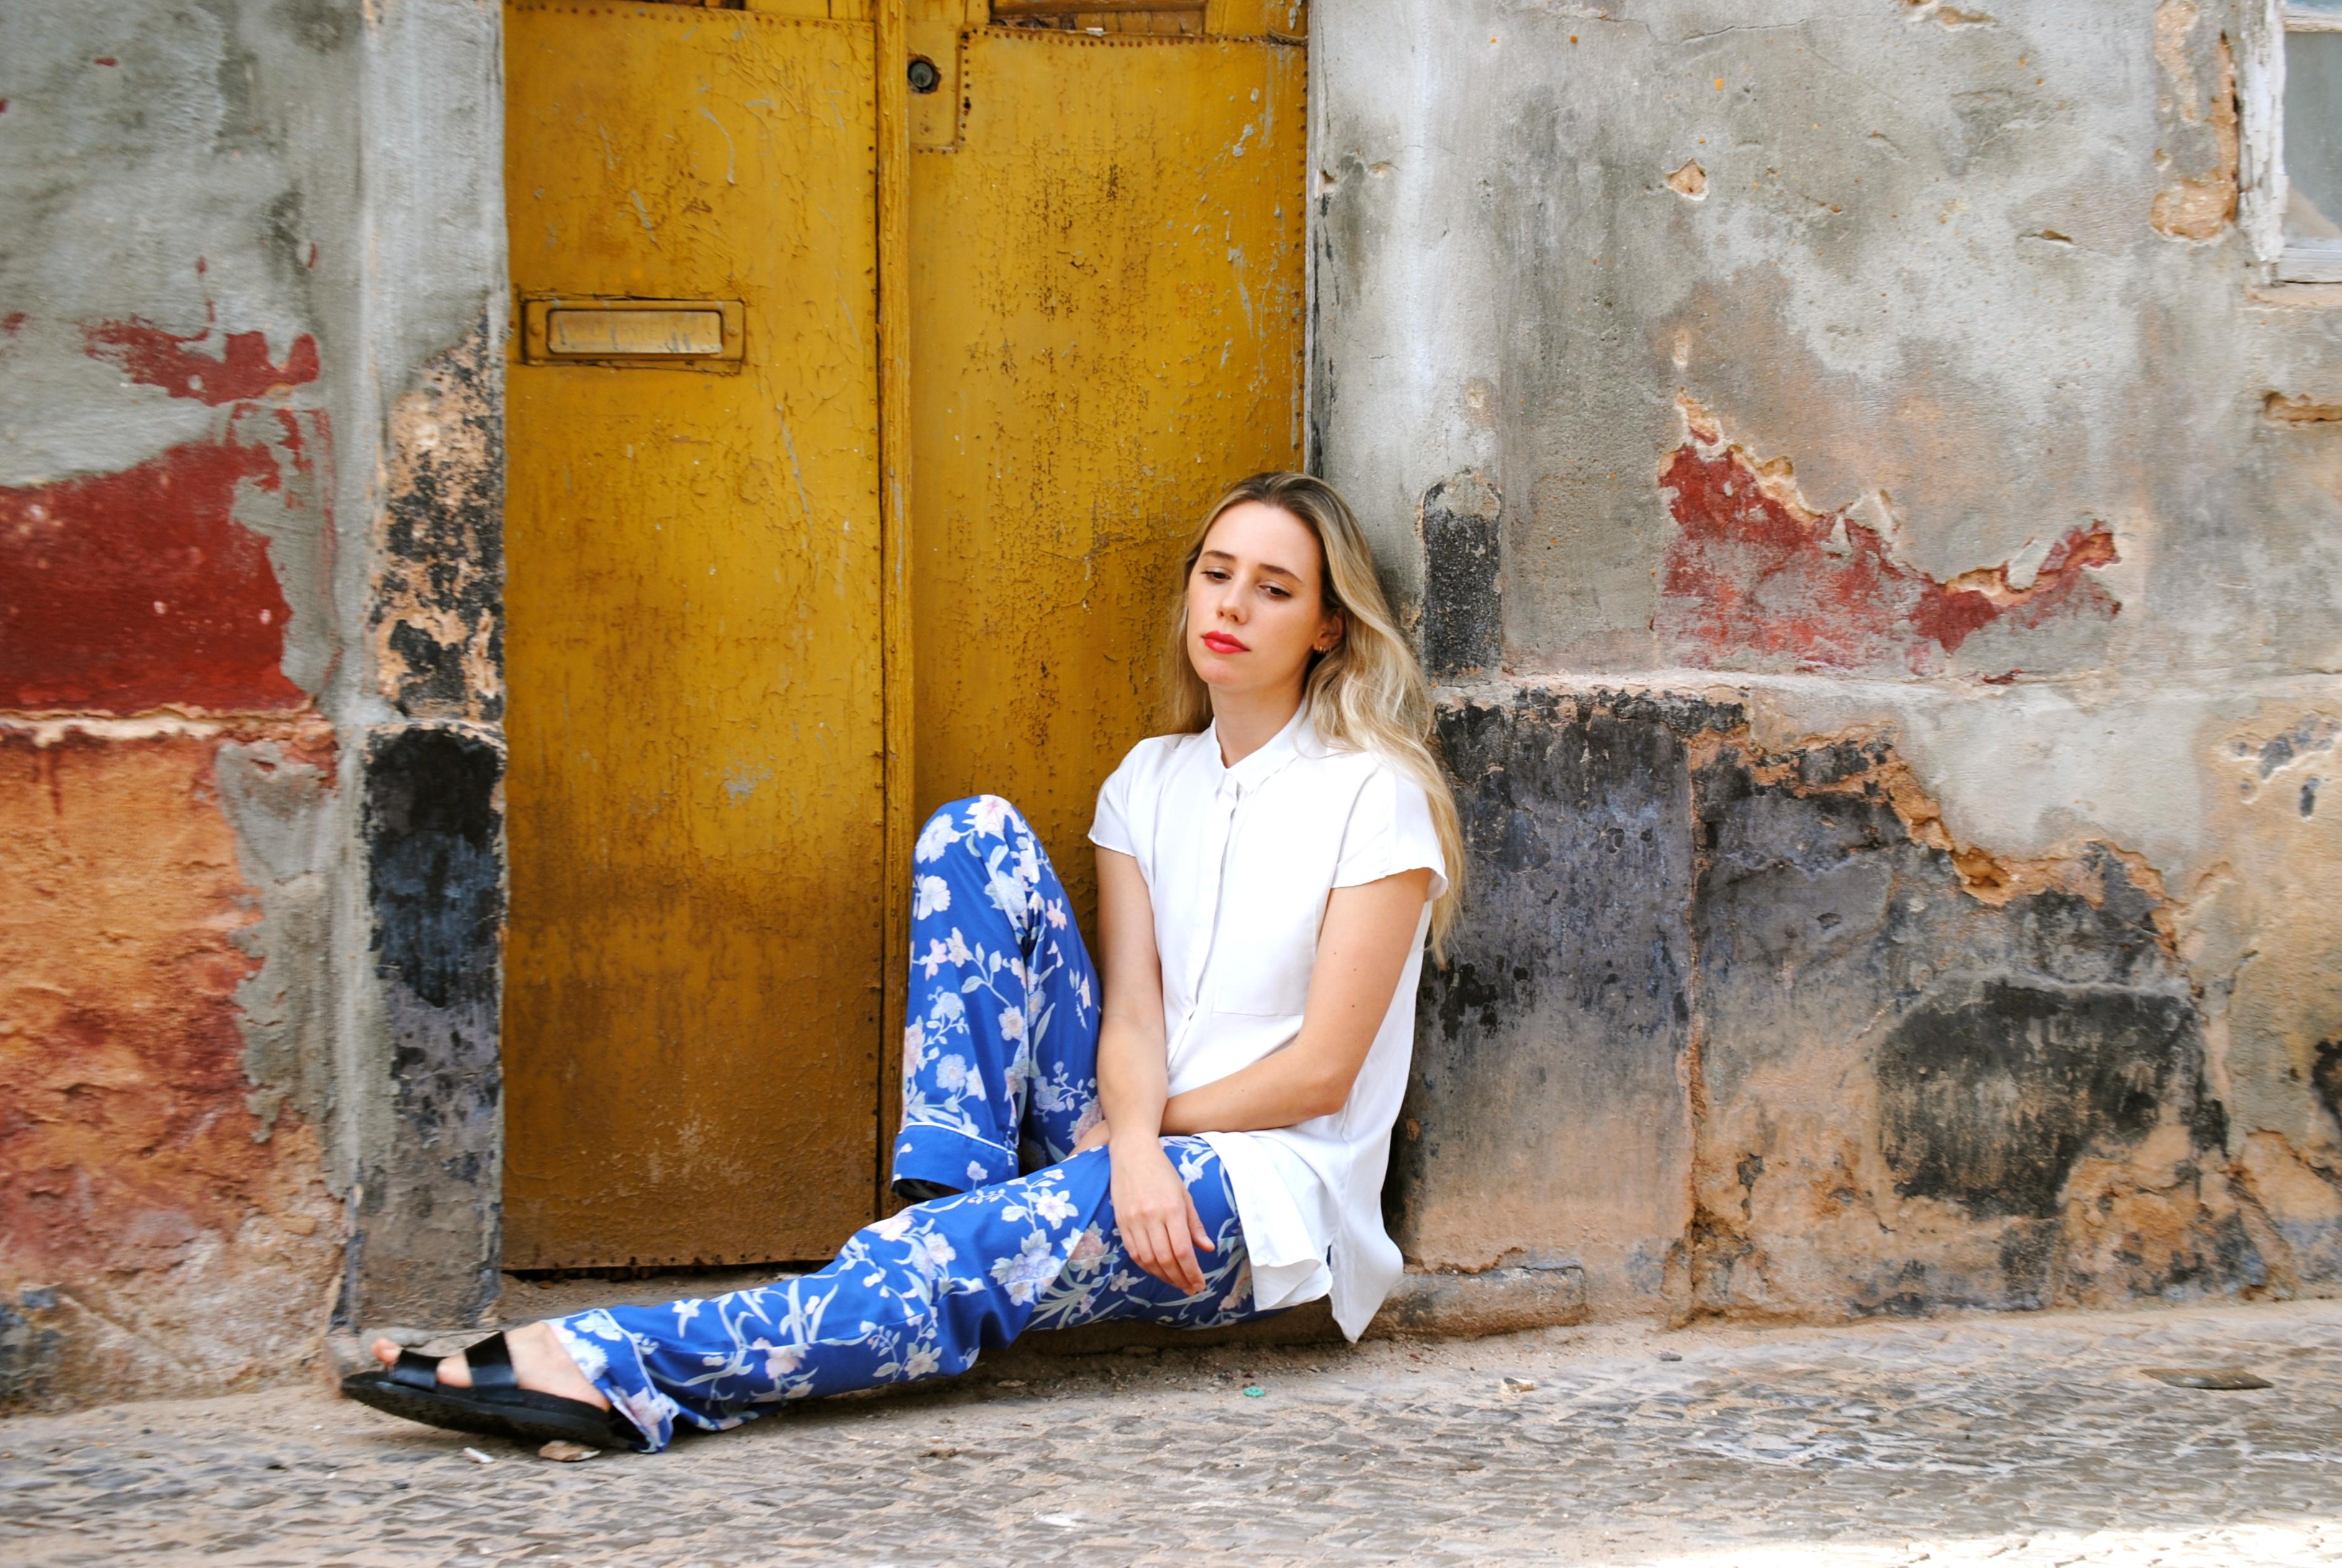 Camisa: COS; Pantalones: Women Secret; Sandalias: Zara; Anillo: Aristocrazy